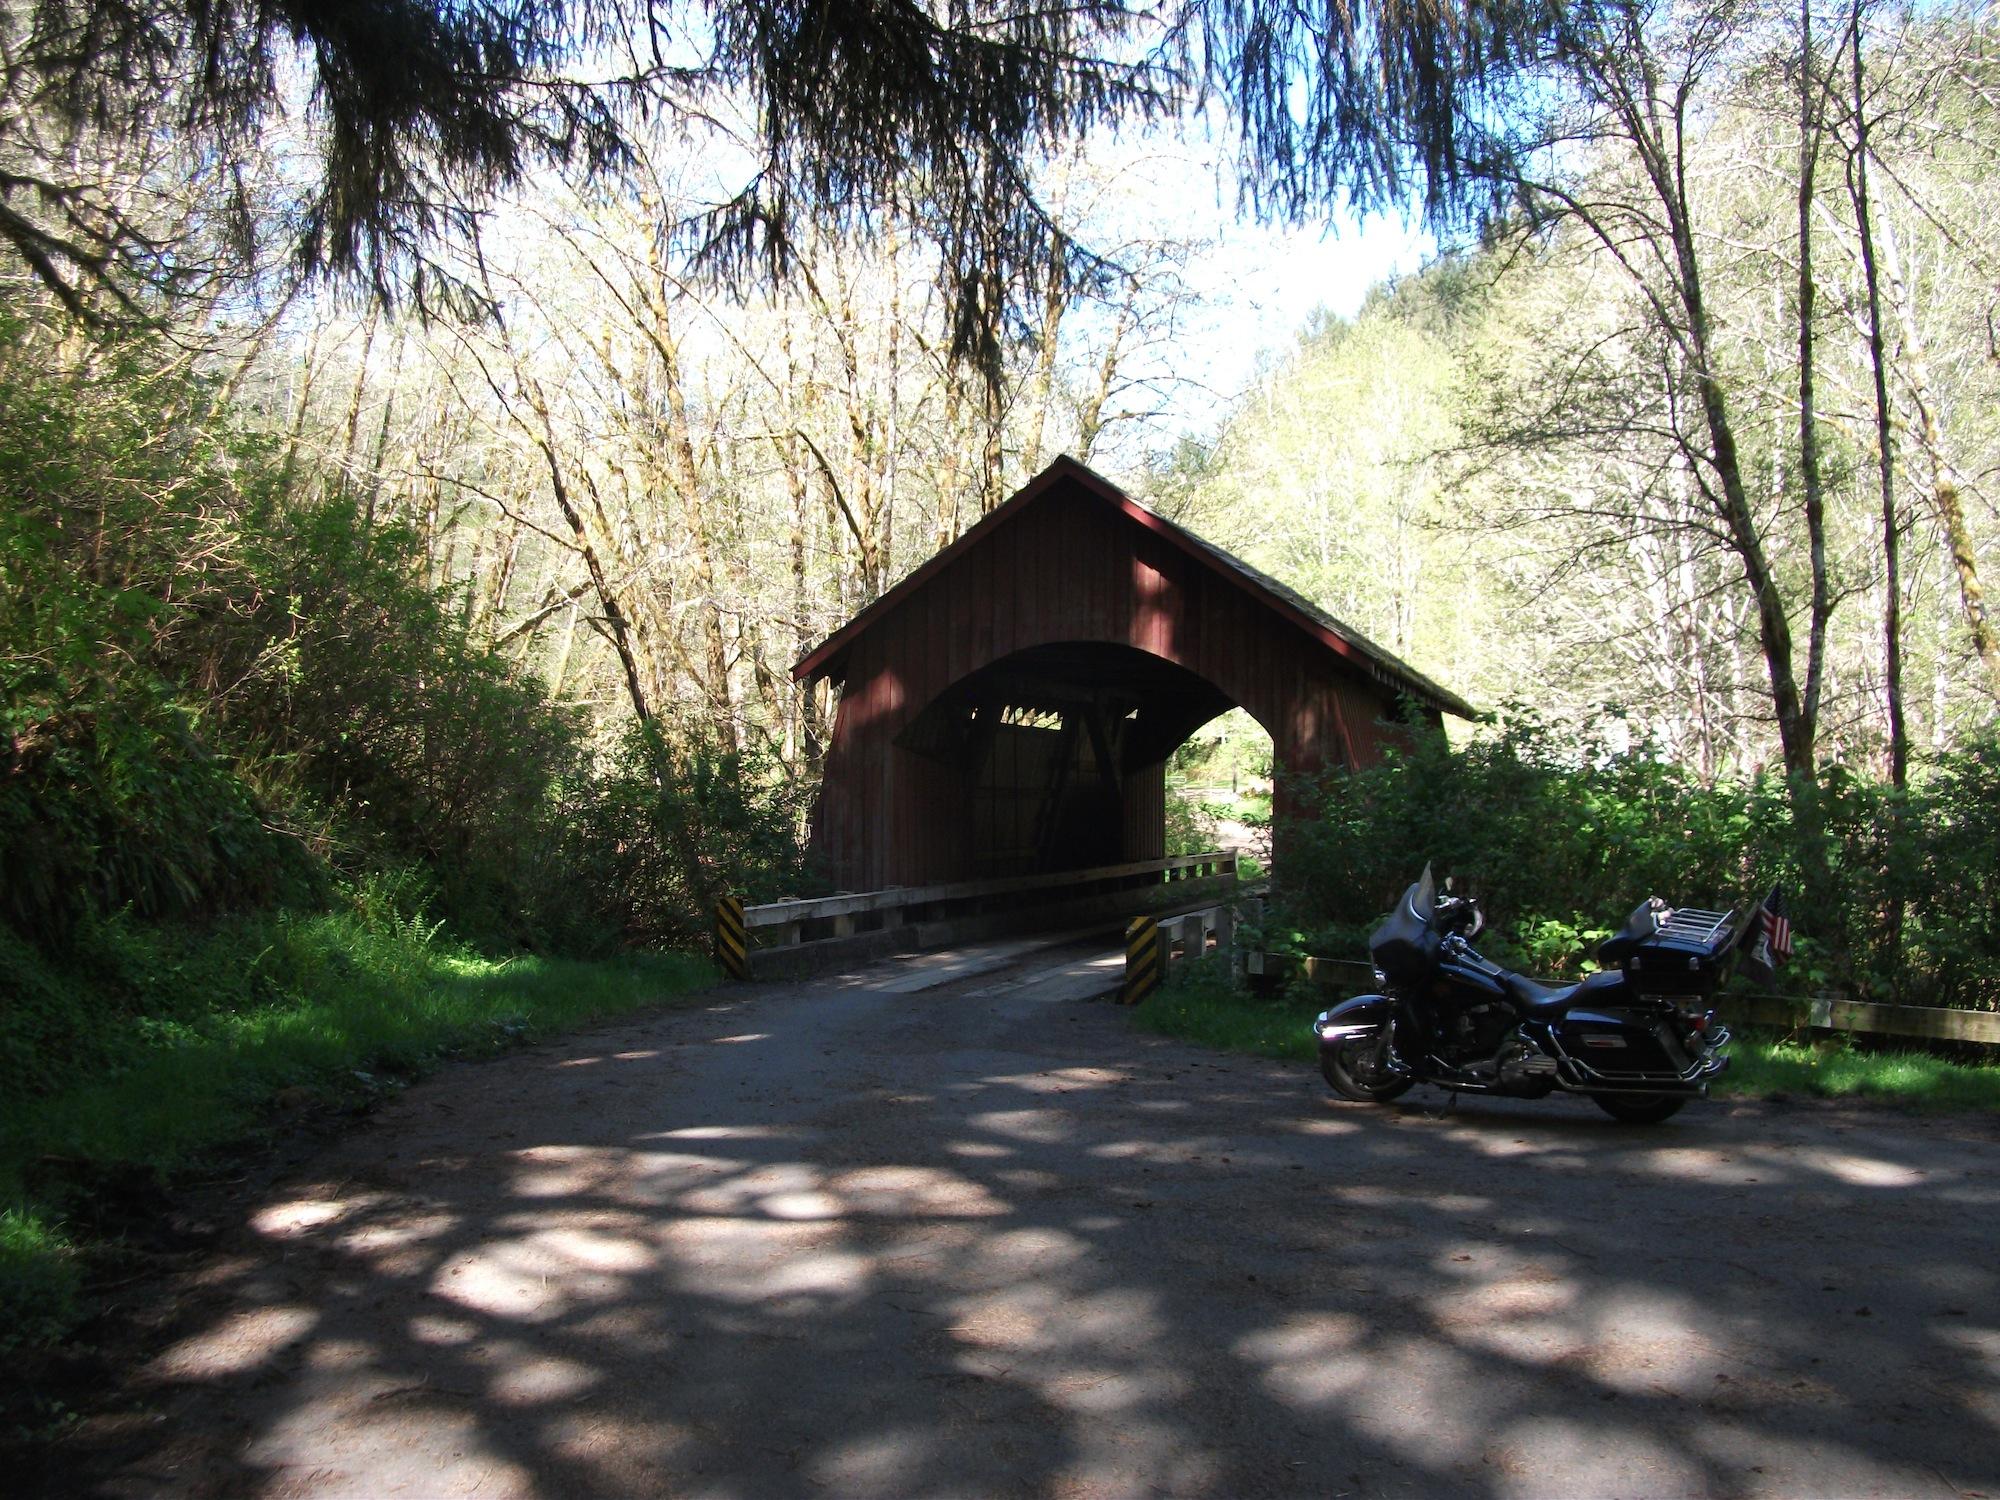 Bridges of Lincoln County-dscf2668.jpg